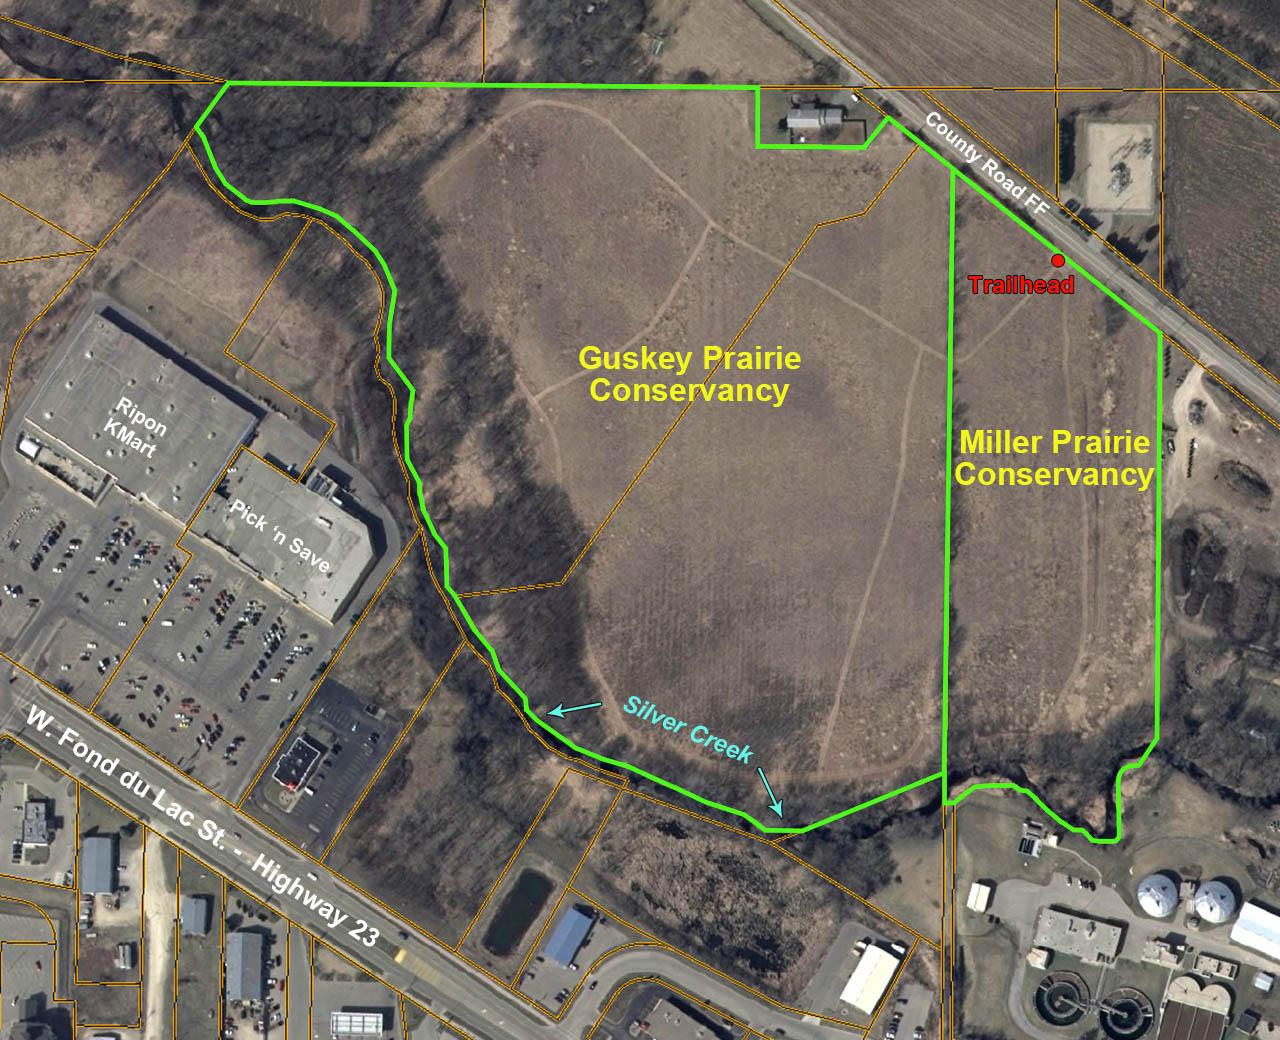 Guskey-Miller Prairies map 2014